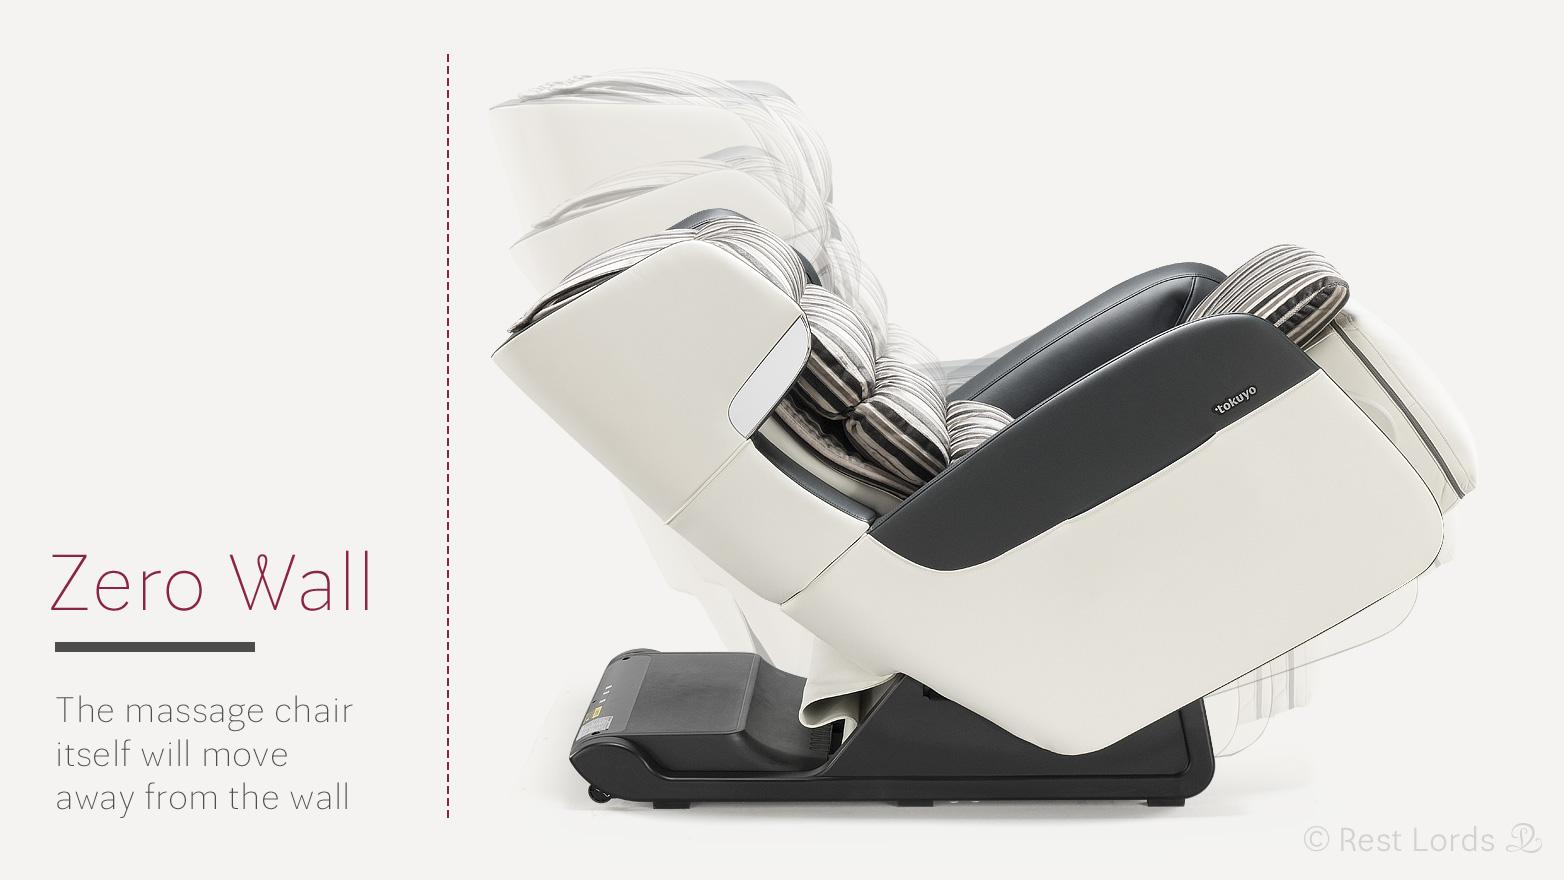 Zero wall at massage chair